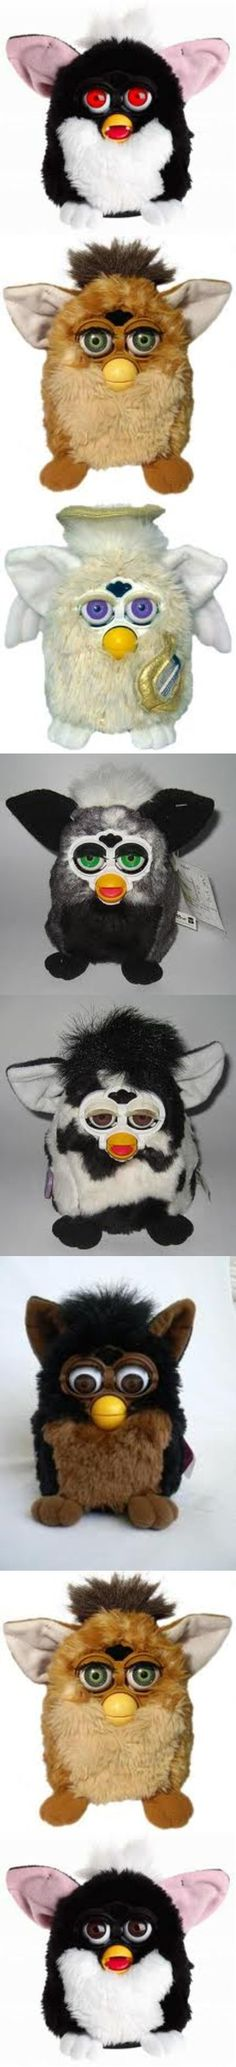 Furby furby.